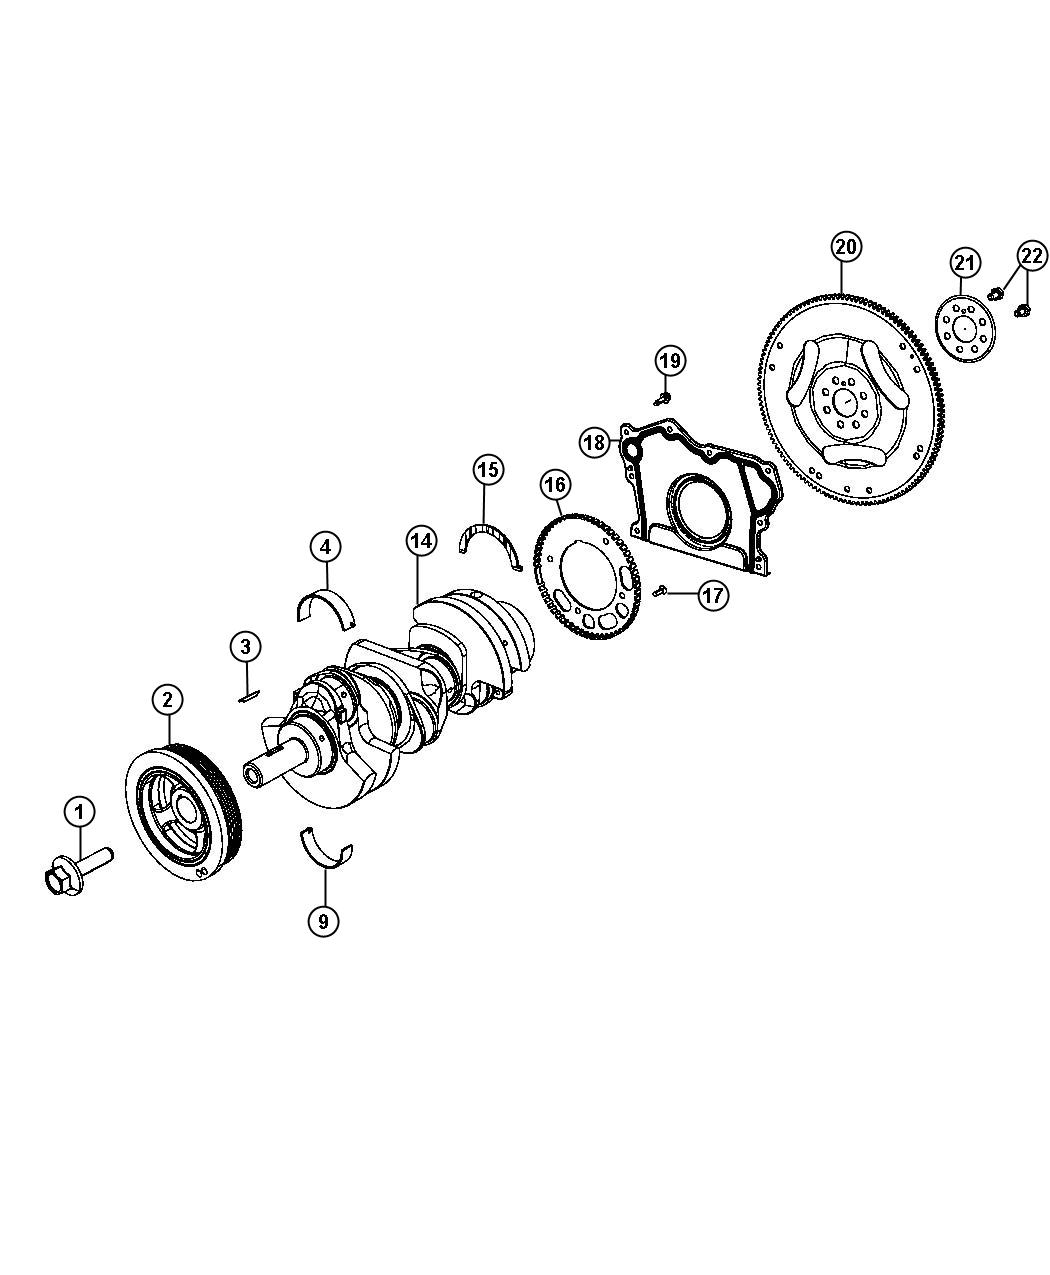 05184105ai dodge bearing crankshaft upper standard